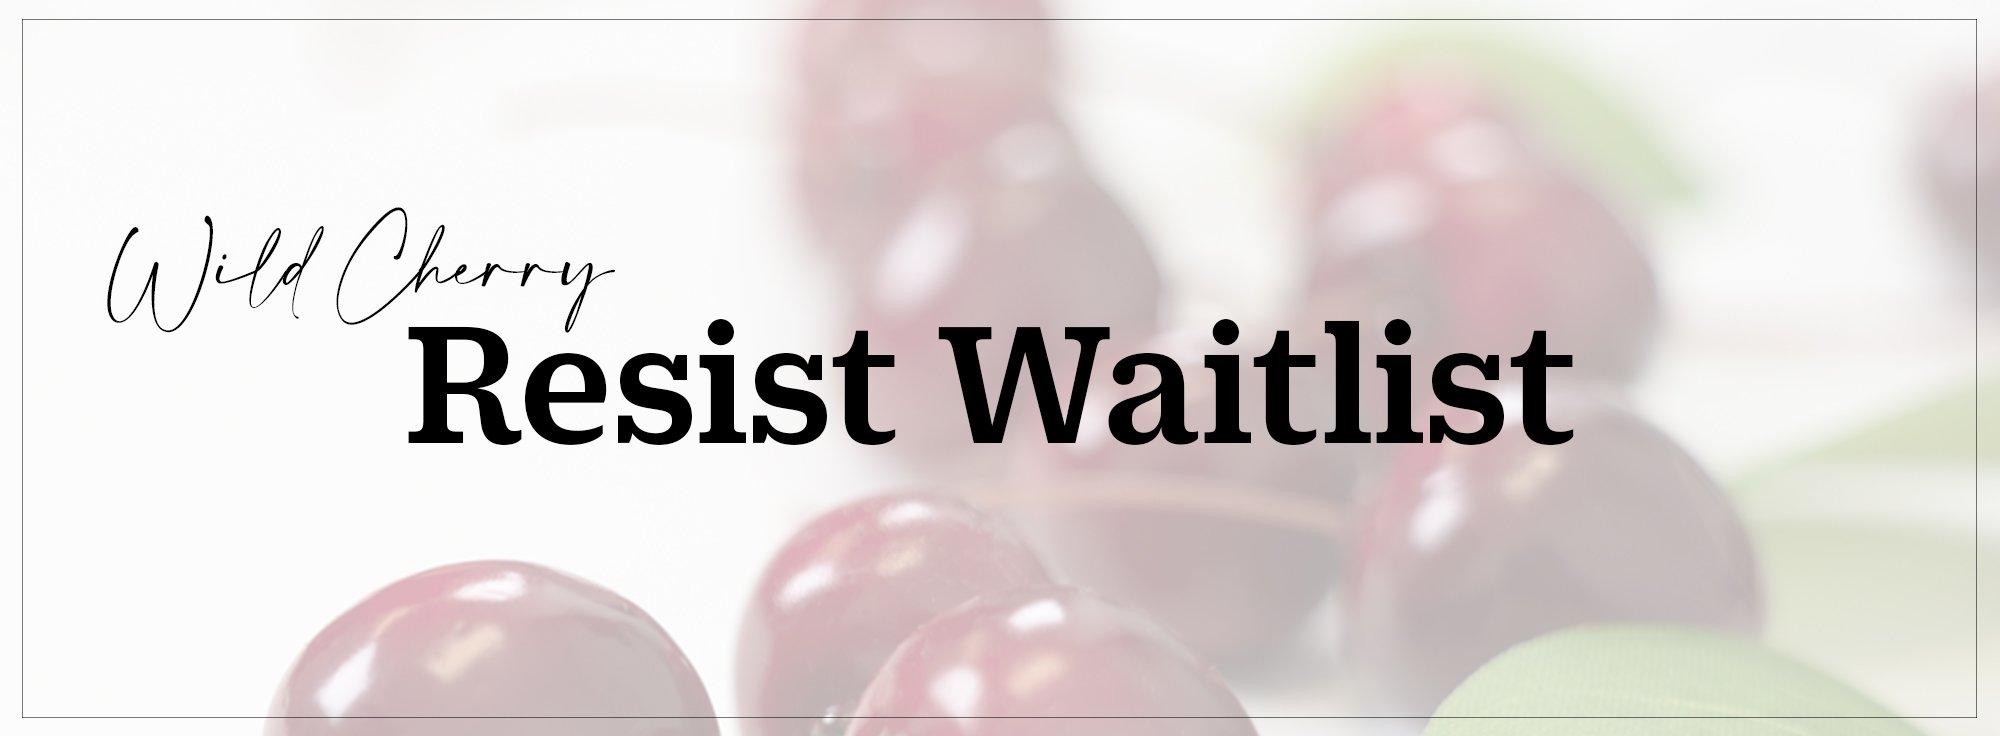 Resist Waitlist